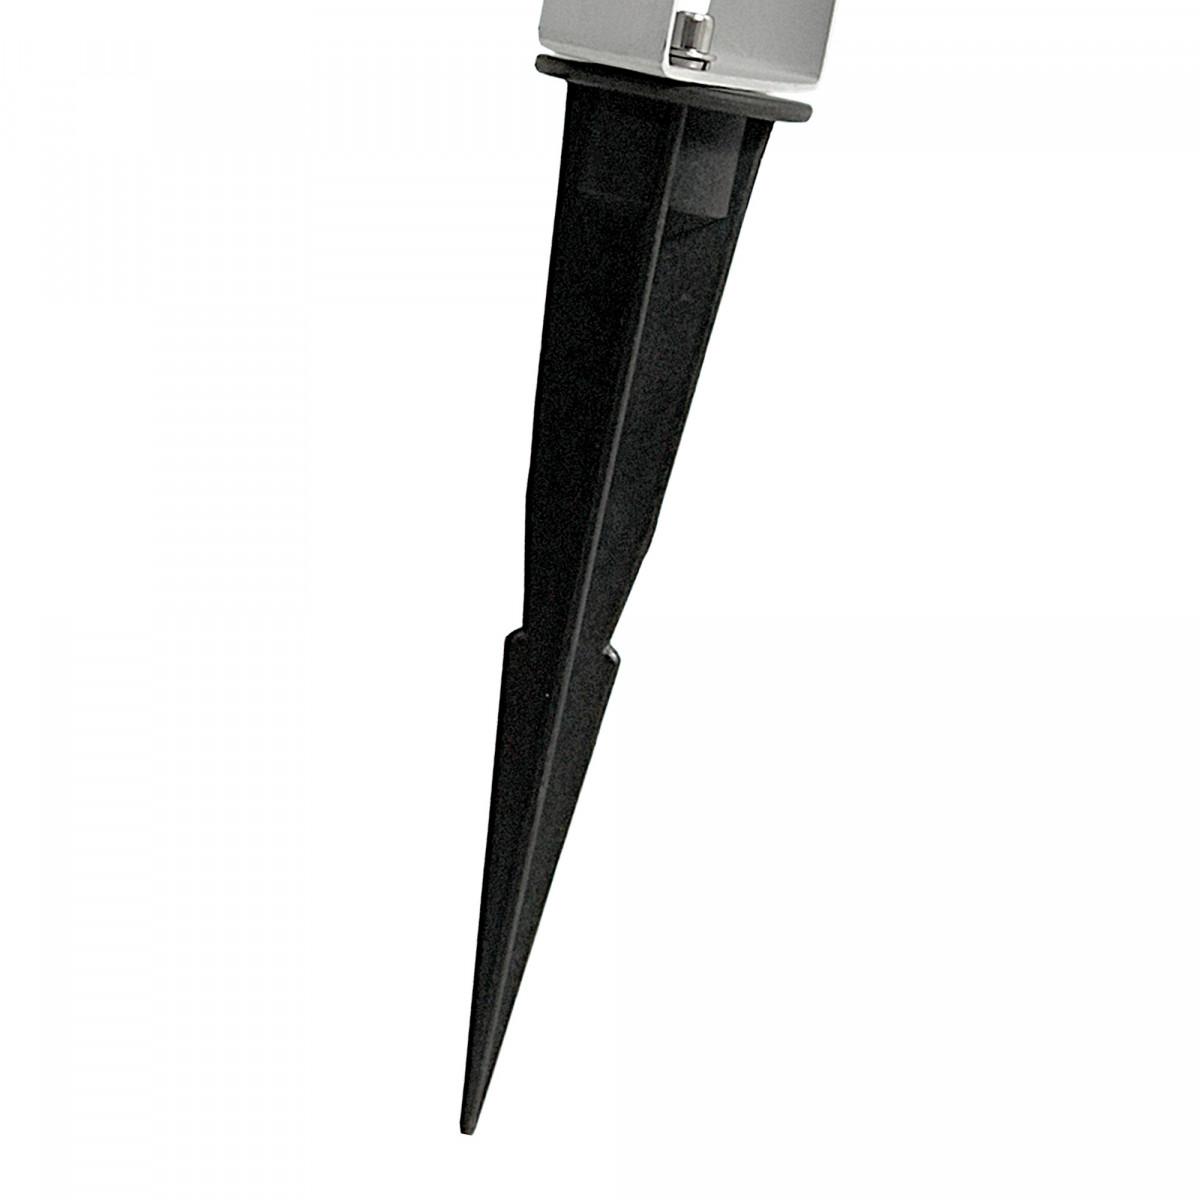 tuinspots - tuinspot LED Beamy KS Verlichting (7113) - KS Verlichting - LED Tuinverlichting